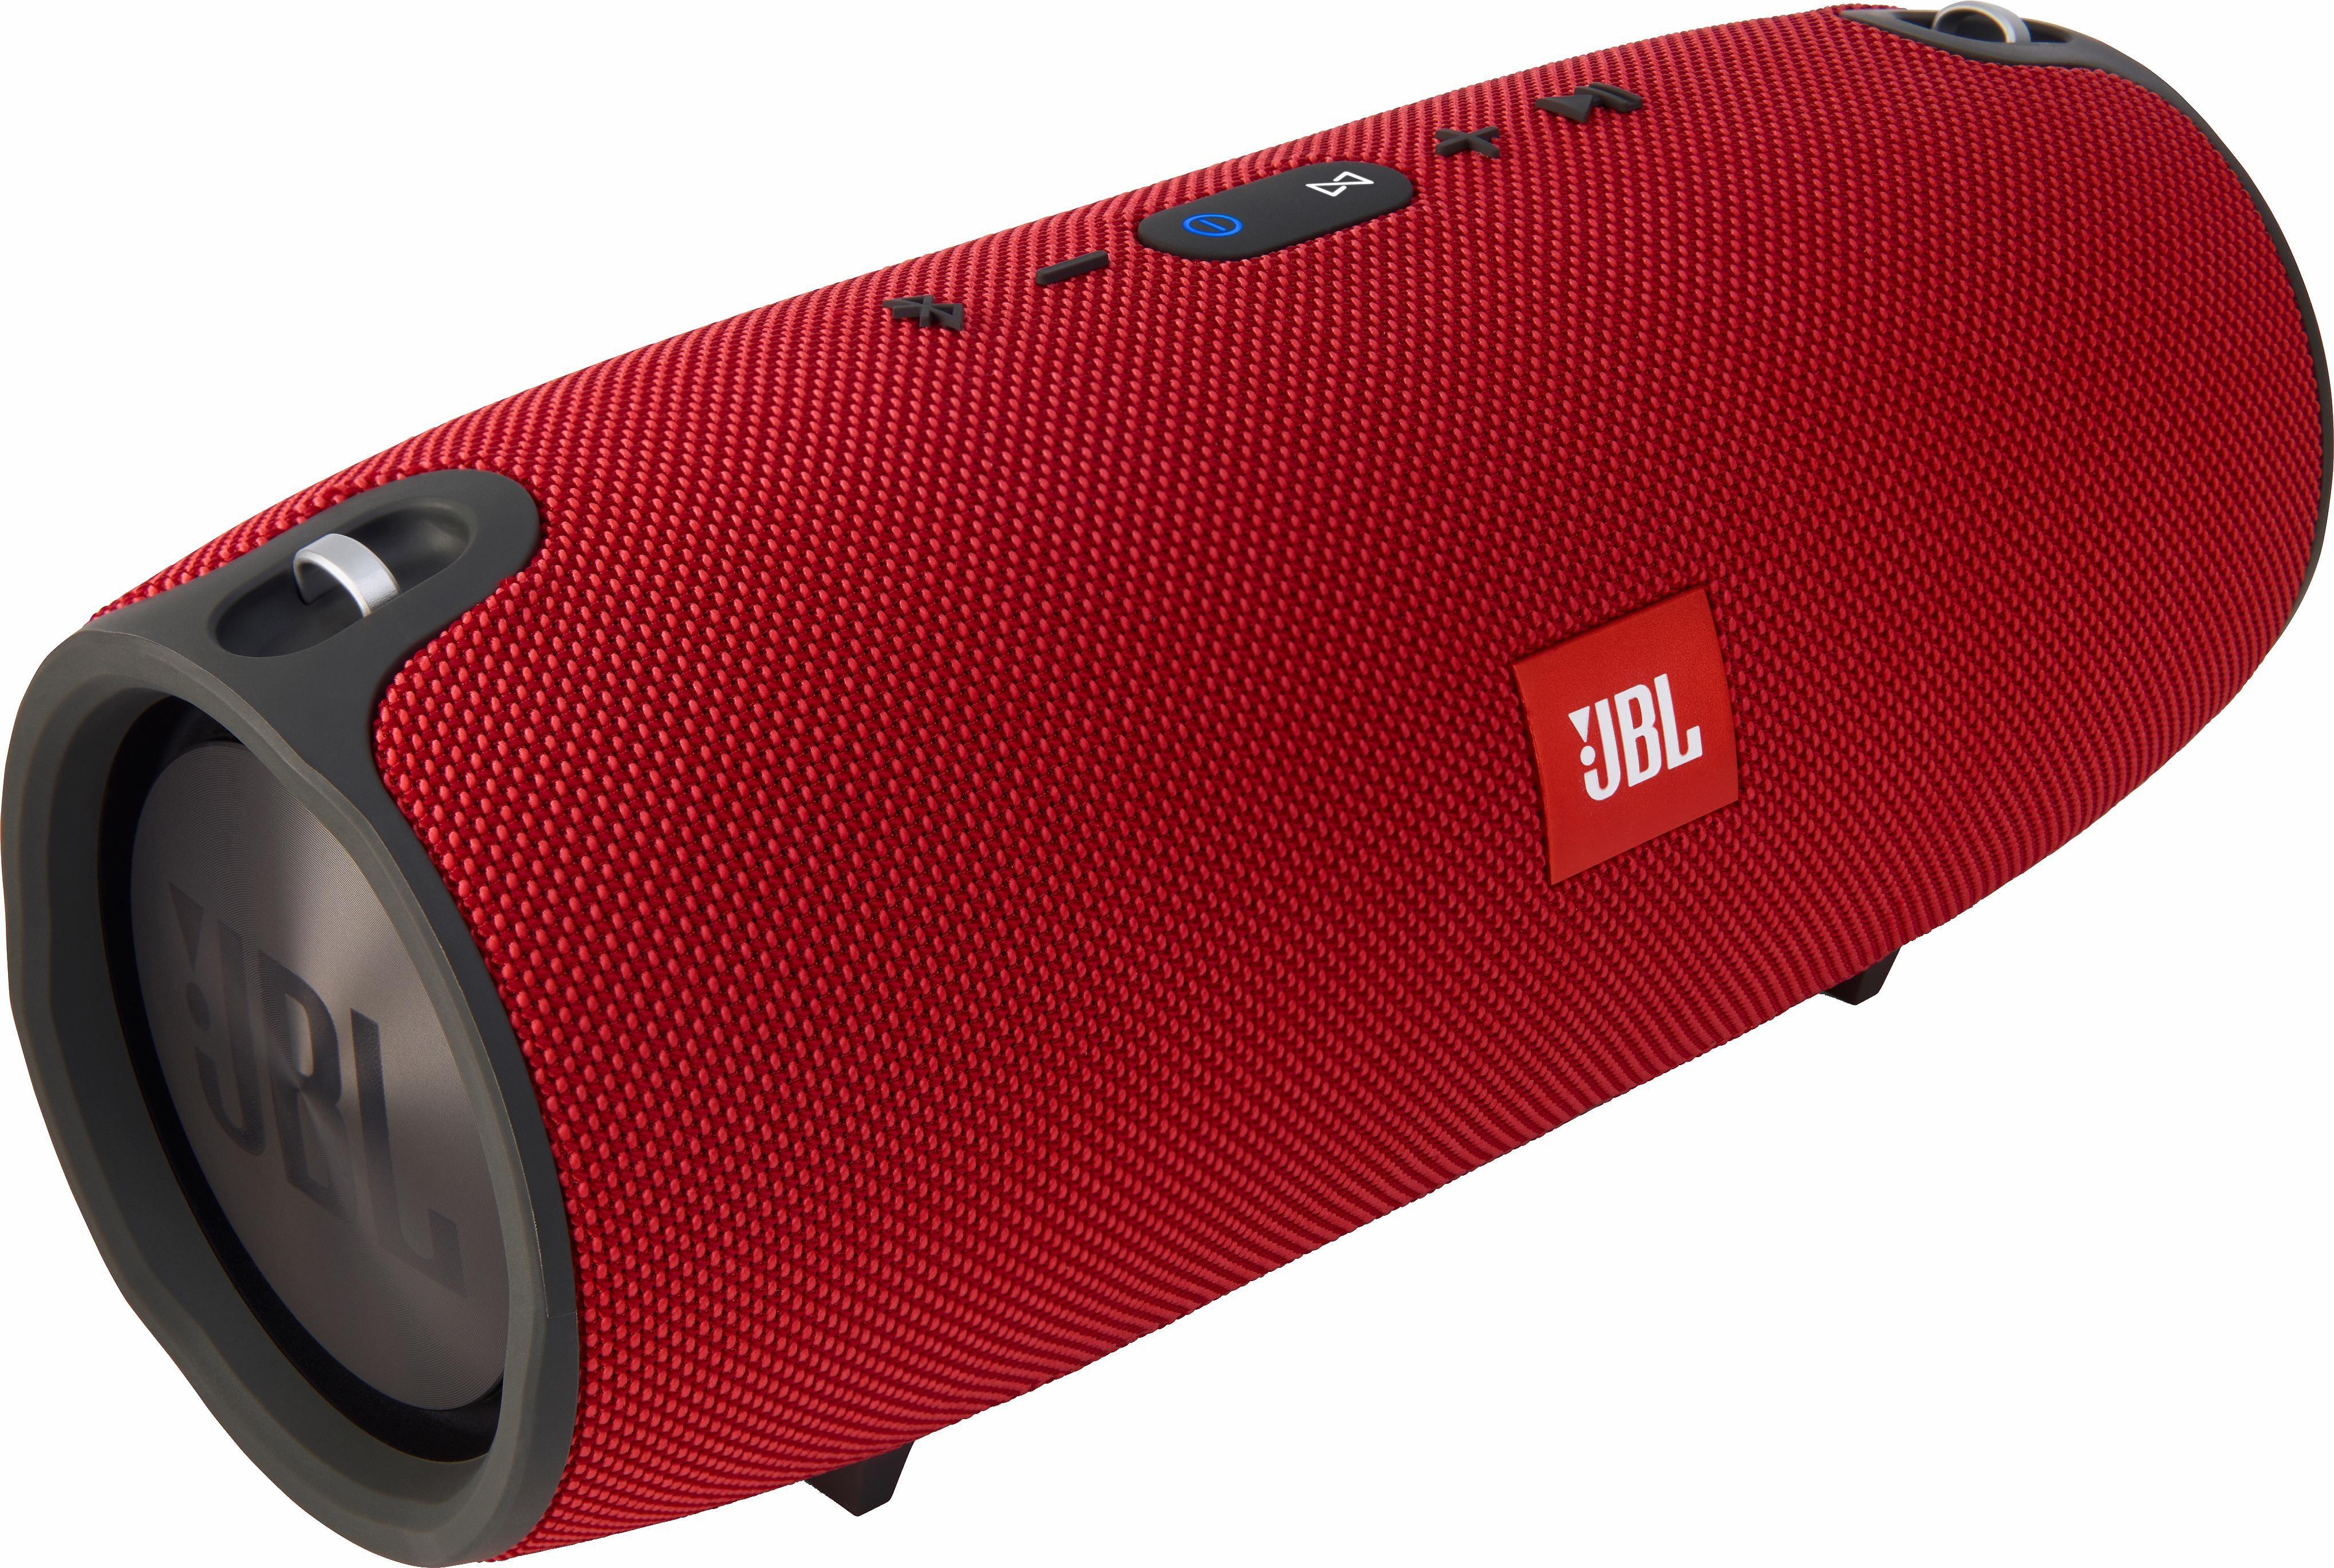 JBL Xtreme Stereo Portable-Lautsprecher (Bluetooth, Freisprechfunktion, 40 W, Geräusch- und Echounterdrückungsfunktion, Freisprechfunktion, Spritzwasserfest, JBL Connect, JBL Bass-Strahler)